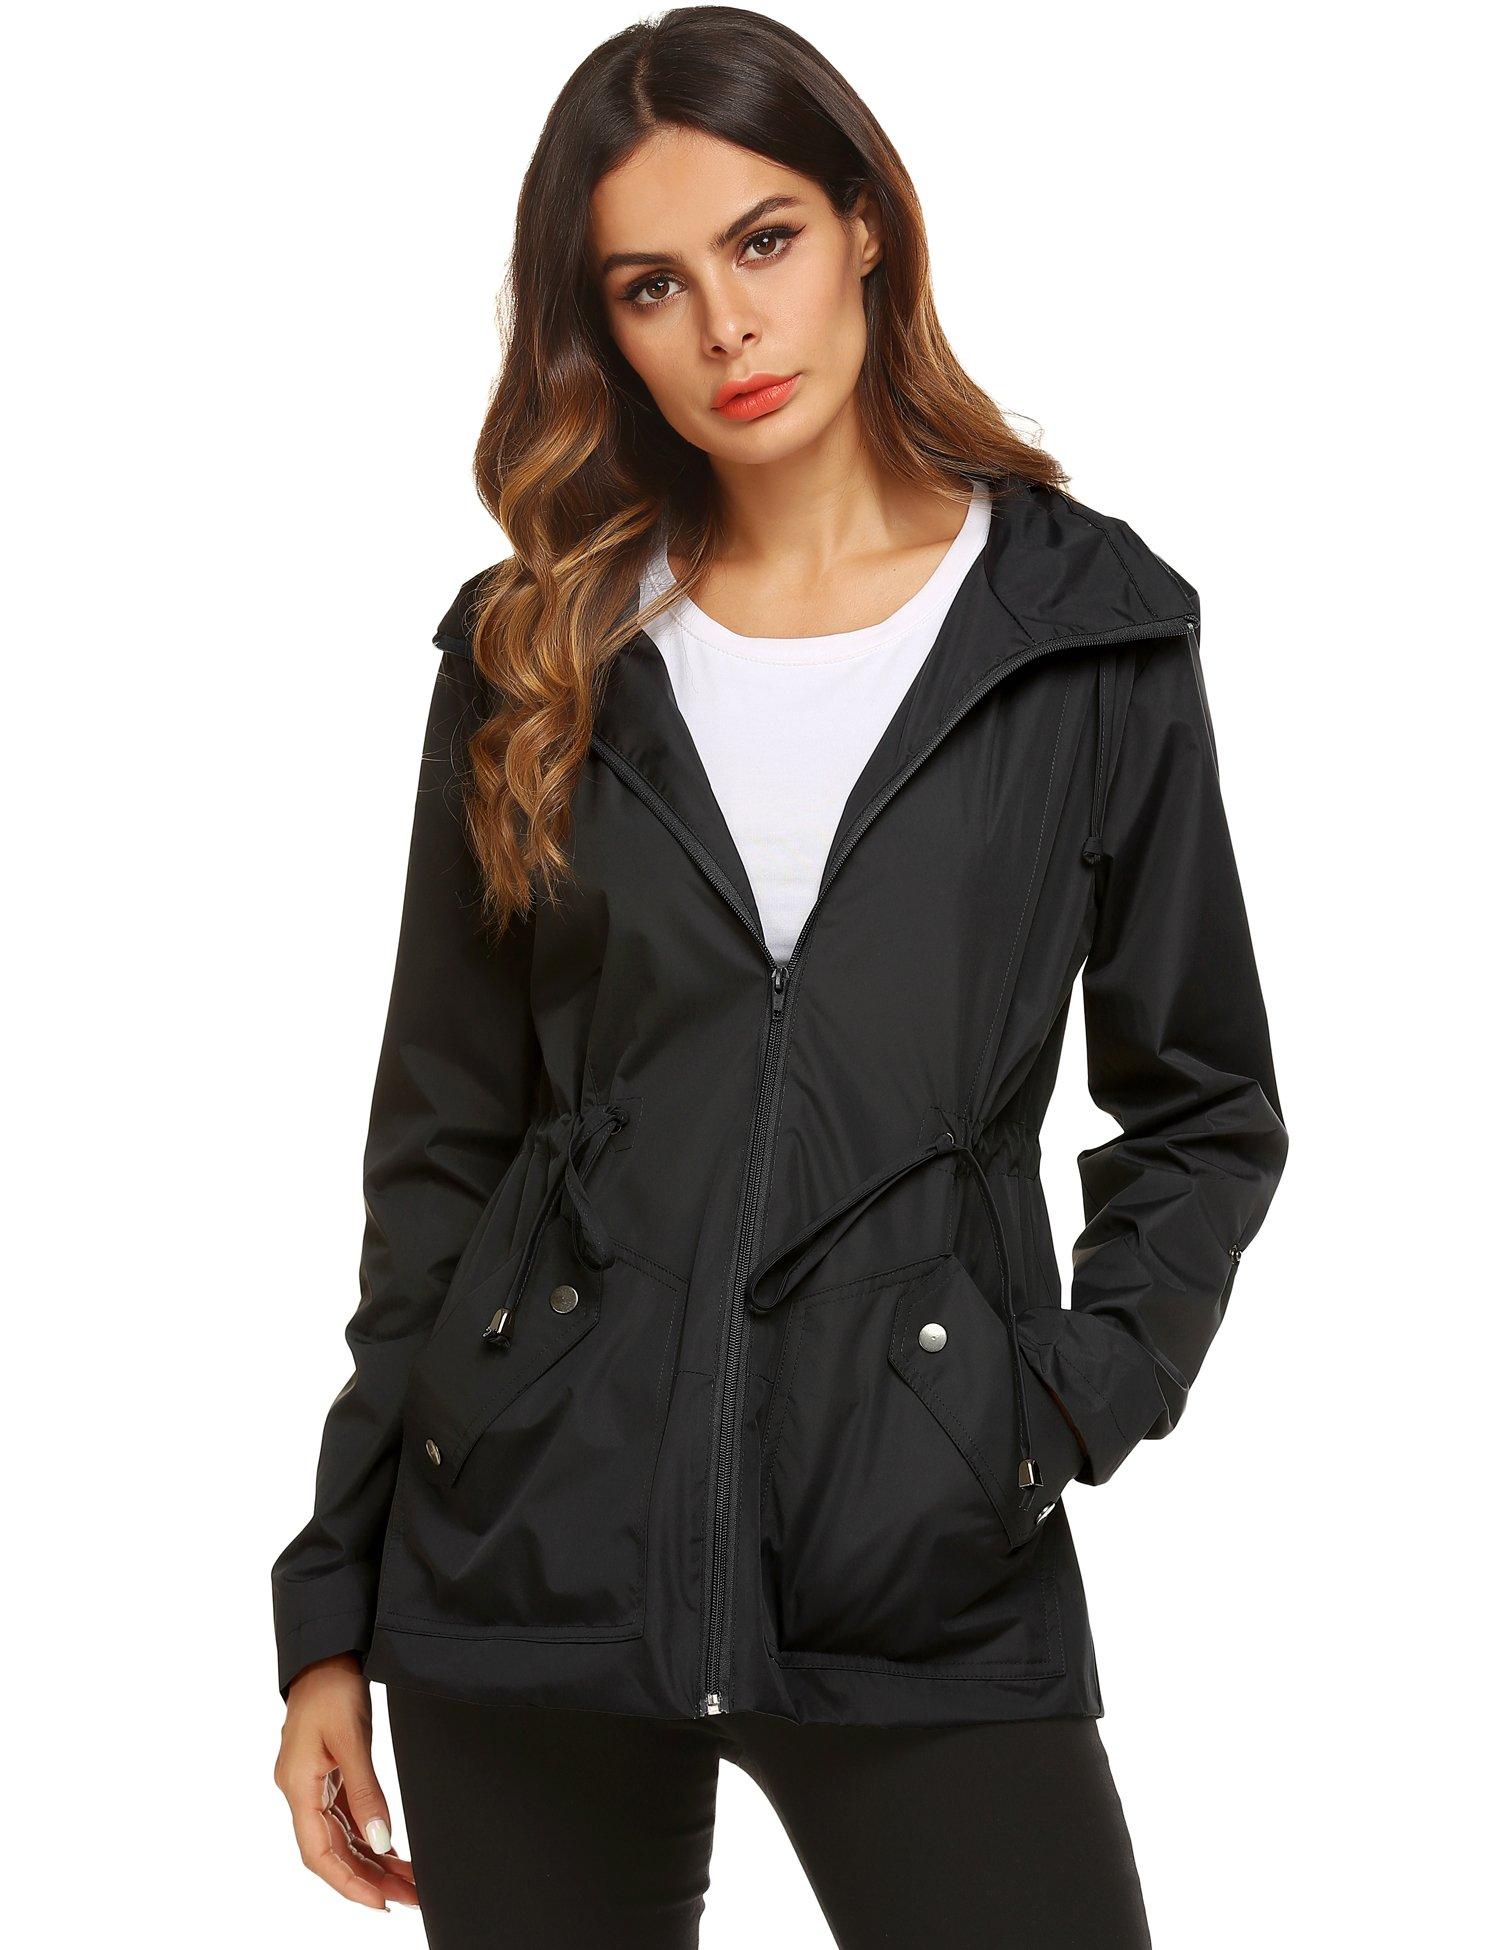 Raincoat Womens Windproof Casual Backpacking